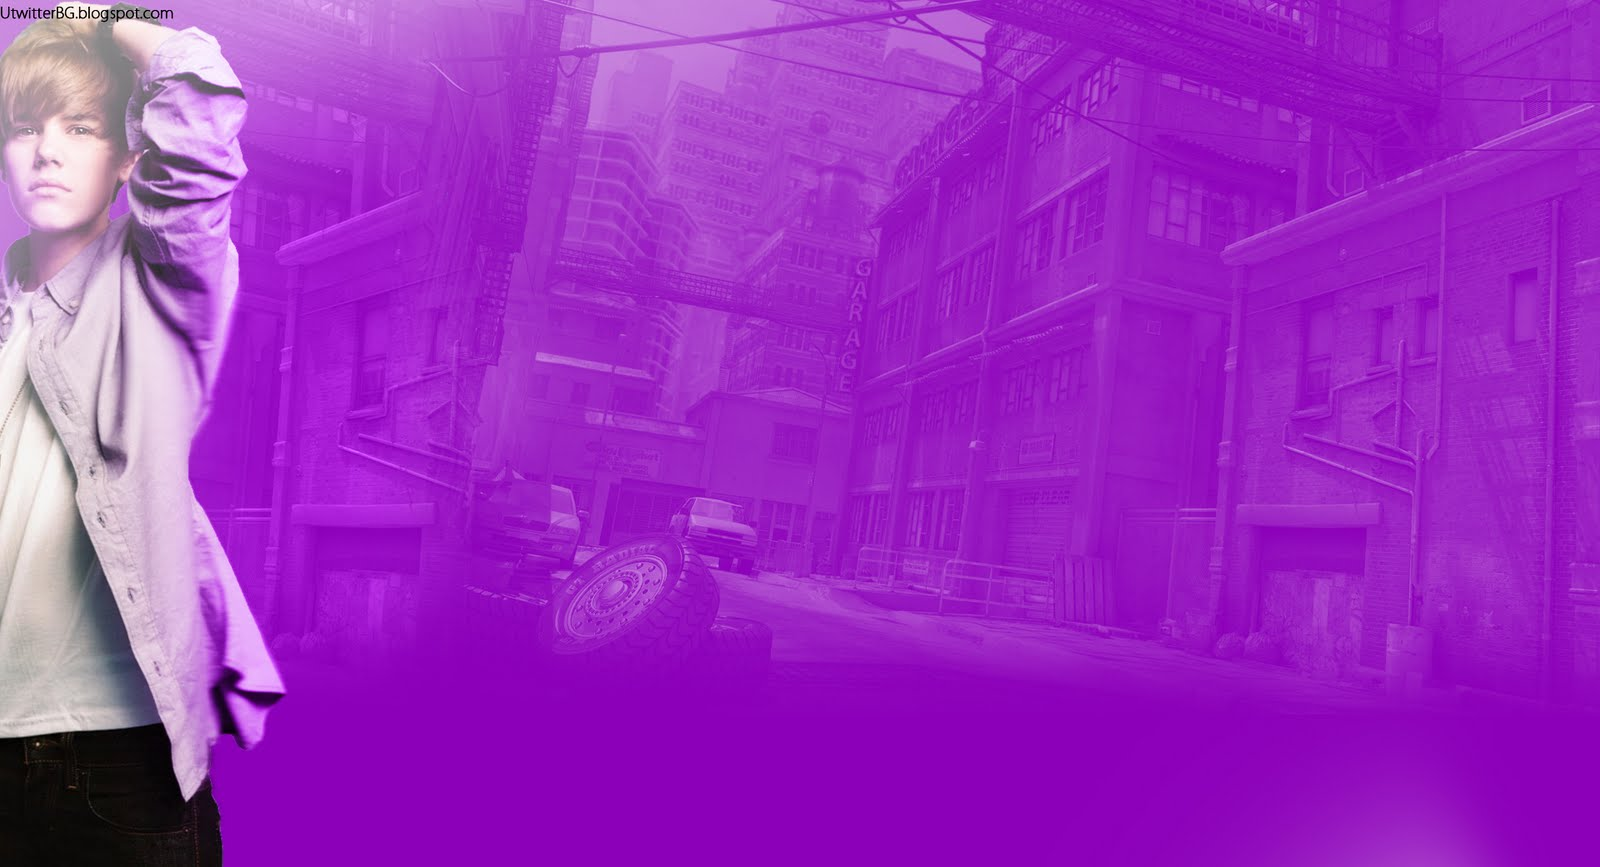 Justin Bieber purple Twitter theme Urban Twitter BackGrounds 1600x867